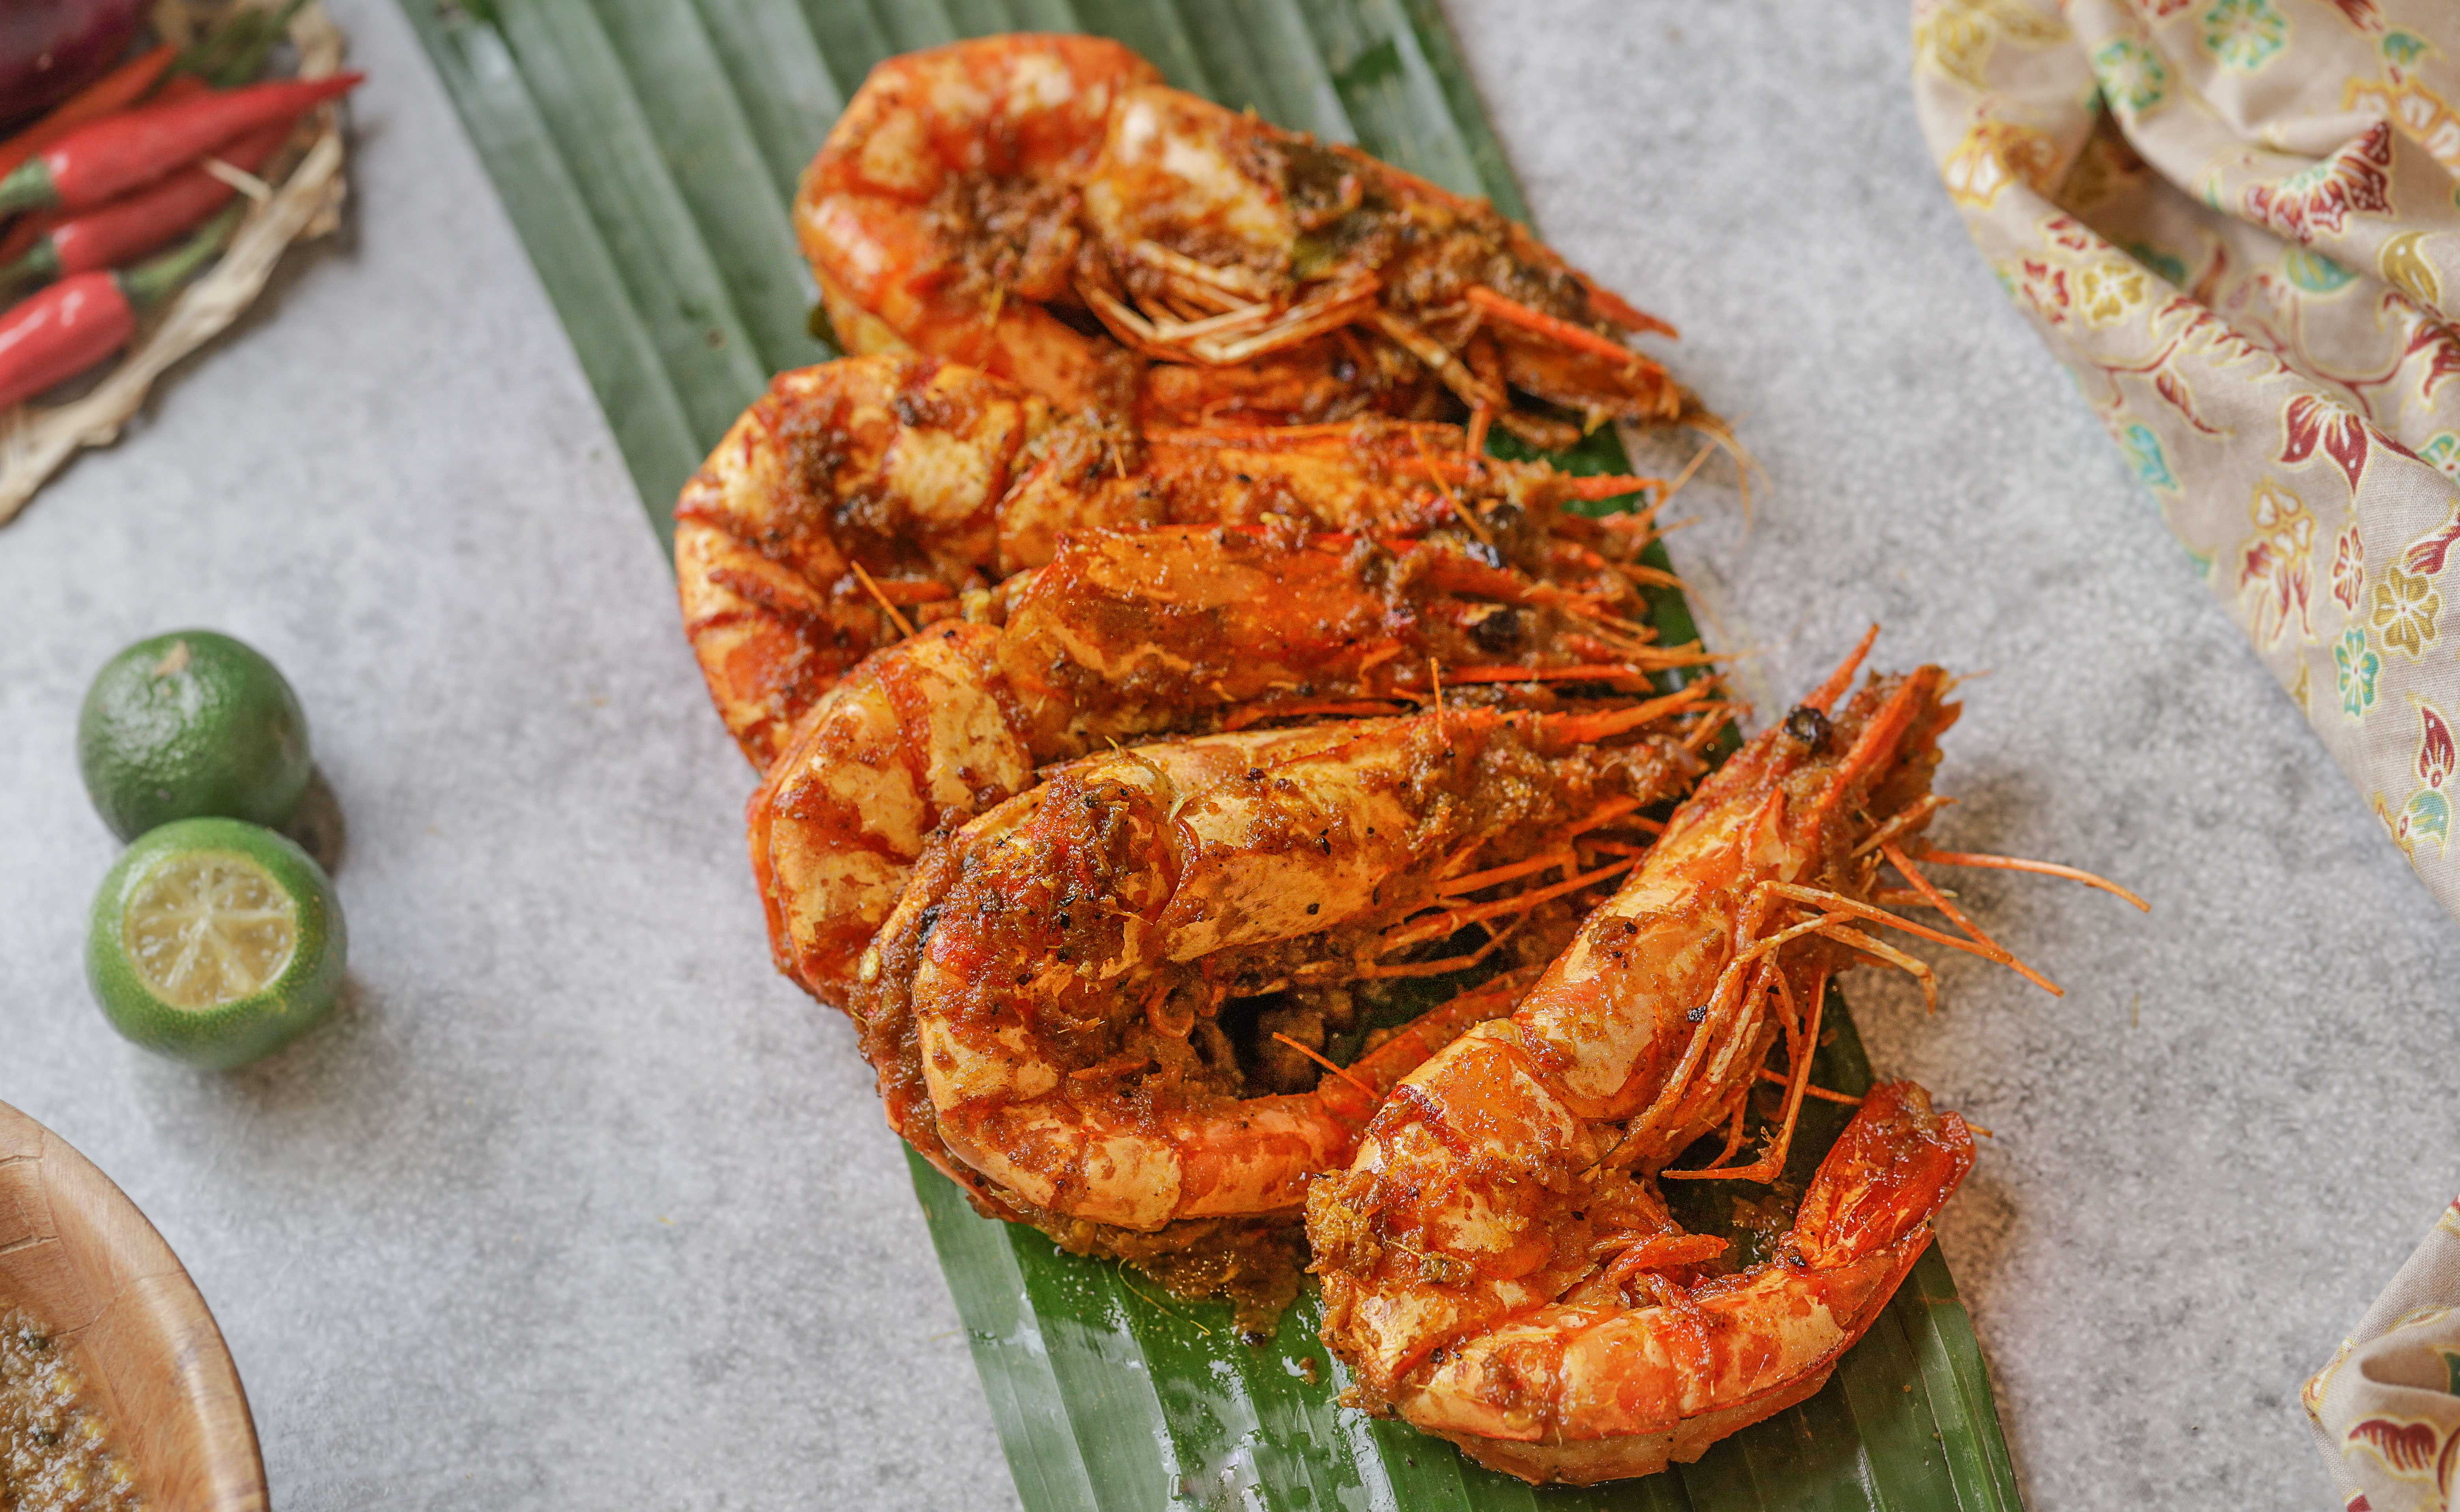 Chef Wan Penang Culture King Tiger Prawn Rendang Rendang Udang Galah